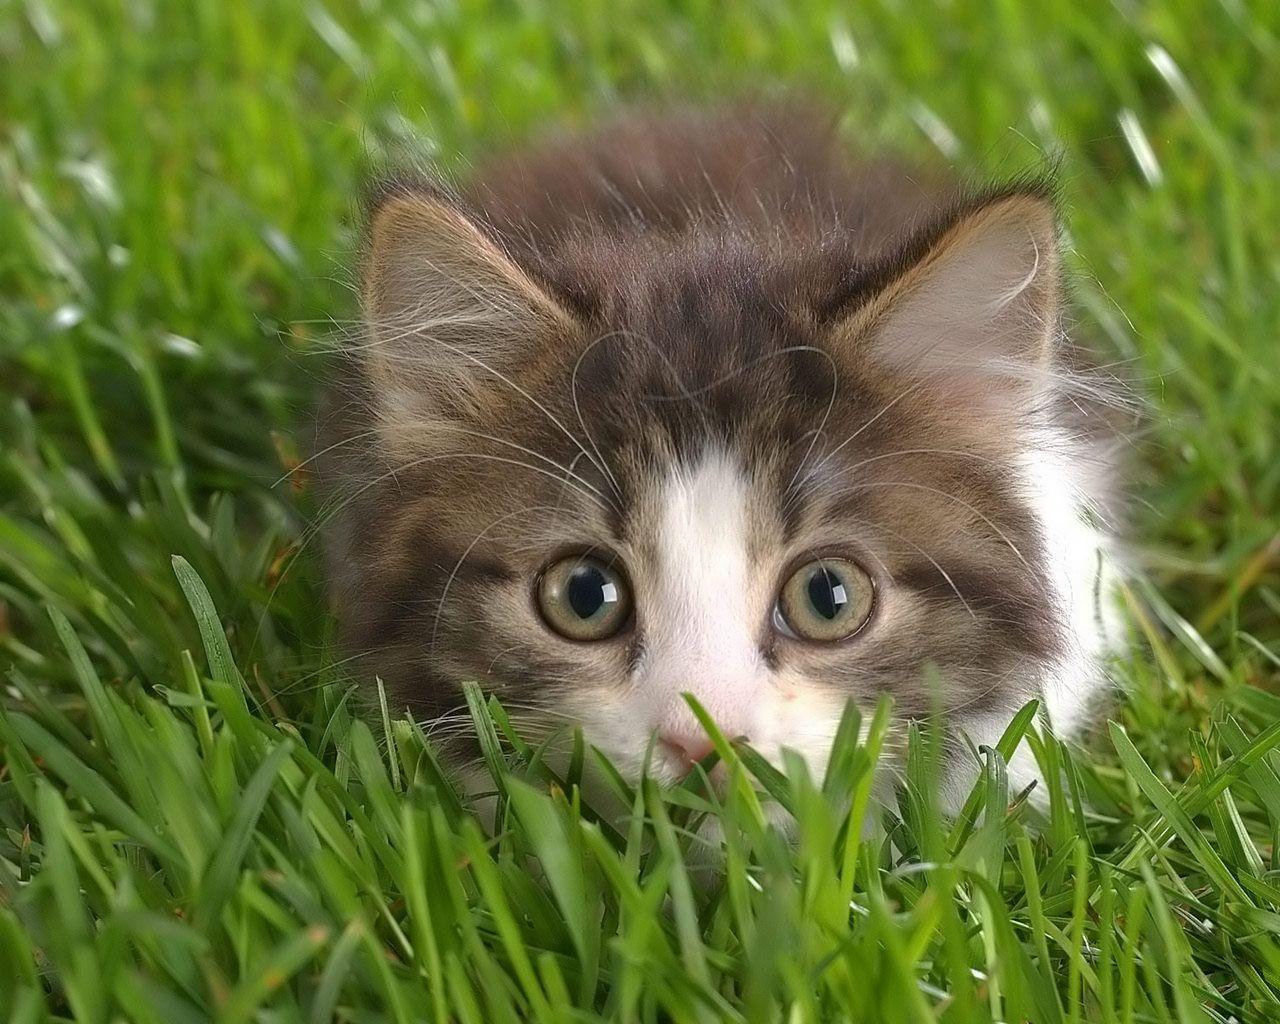 Kitty Pics Bilder - Kitty Pics Bilder